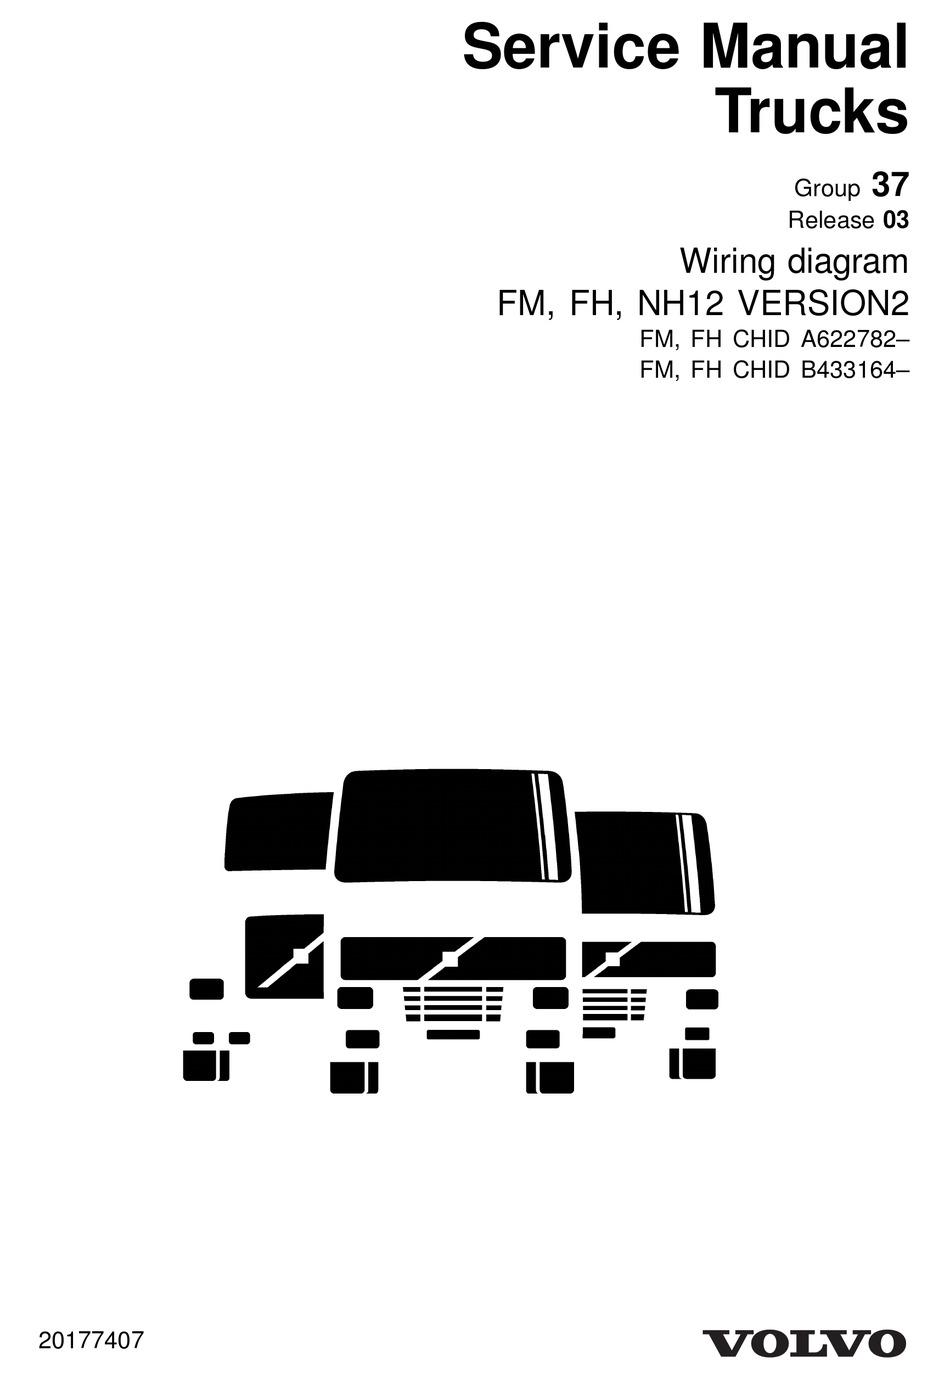 VOLVO FM SERIES WIRING DIAGRAM Pdf Download | ManualsLib | Volvo Fm 400 Wiring Diagram |  | ManualsLib